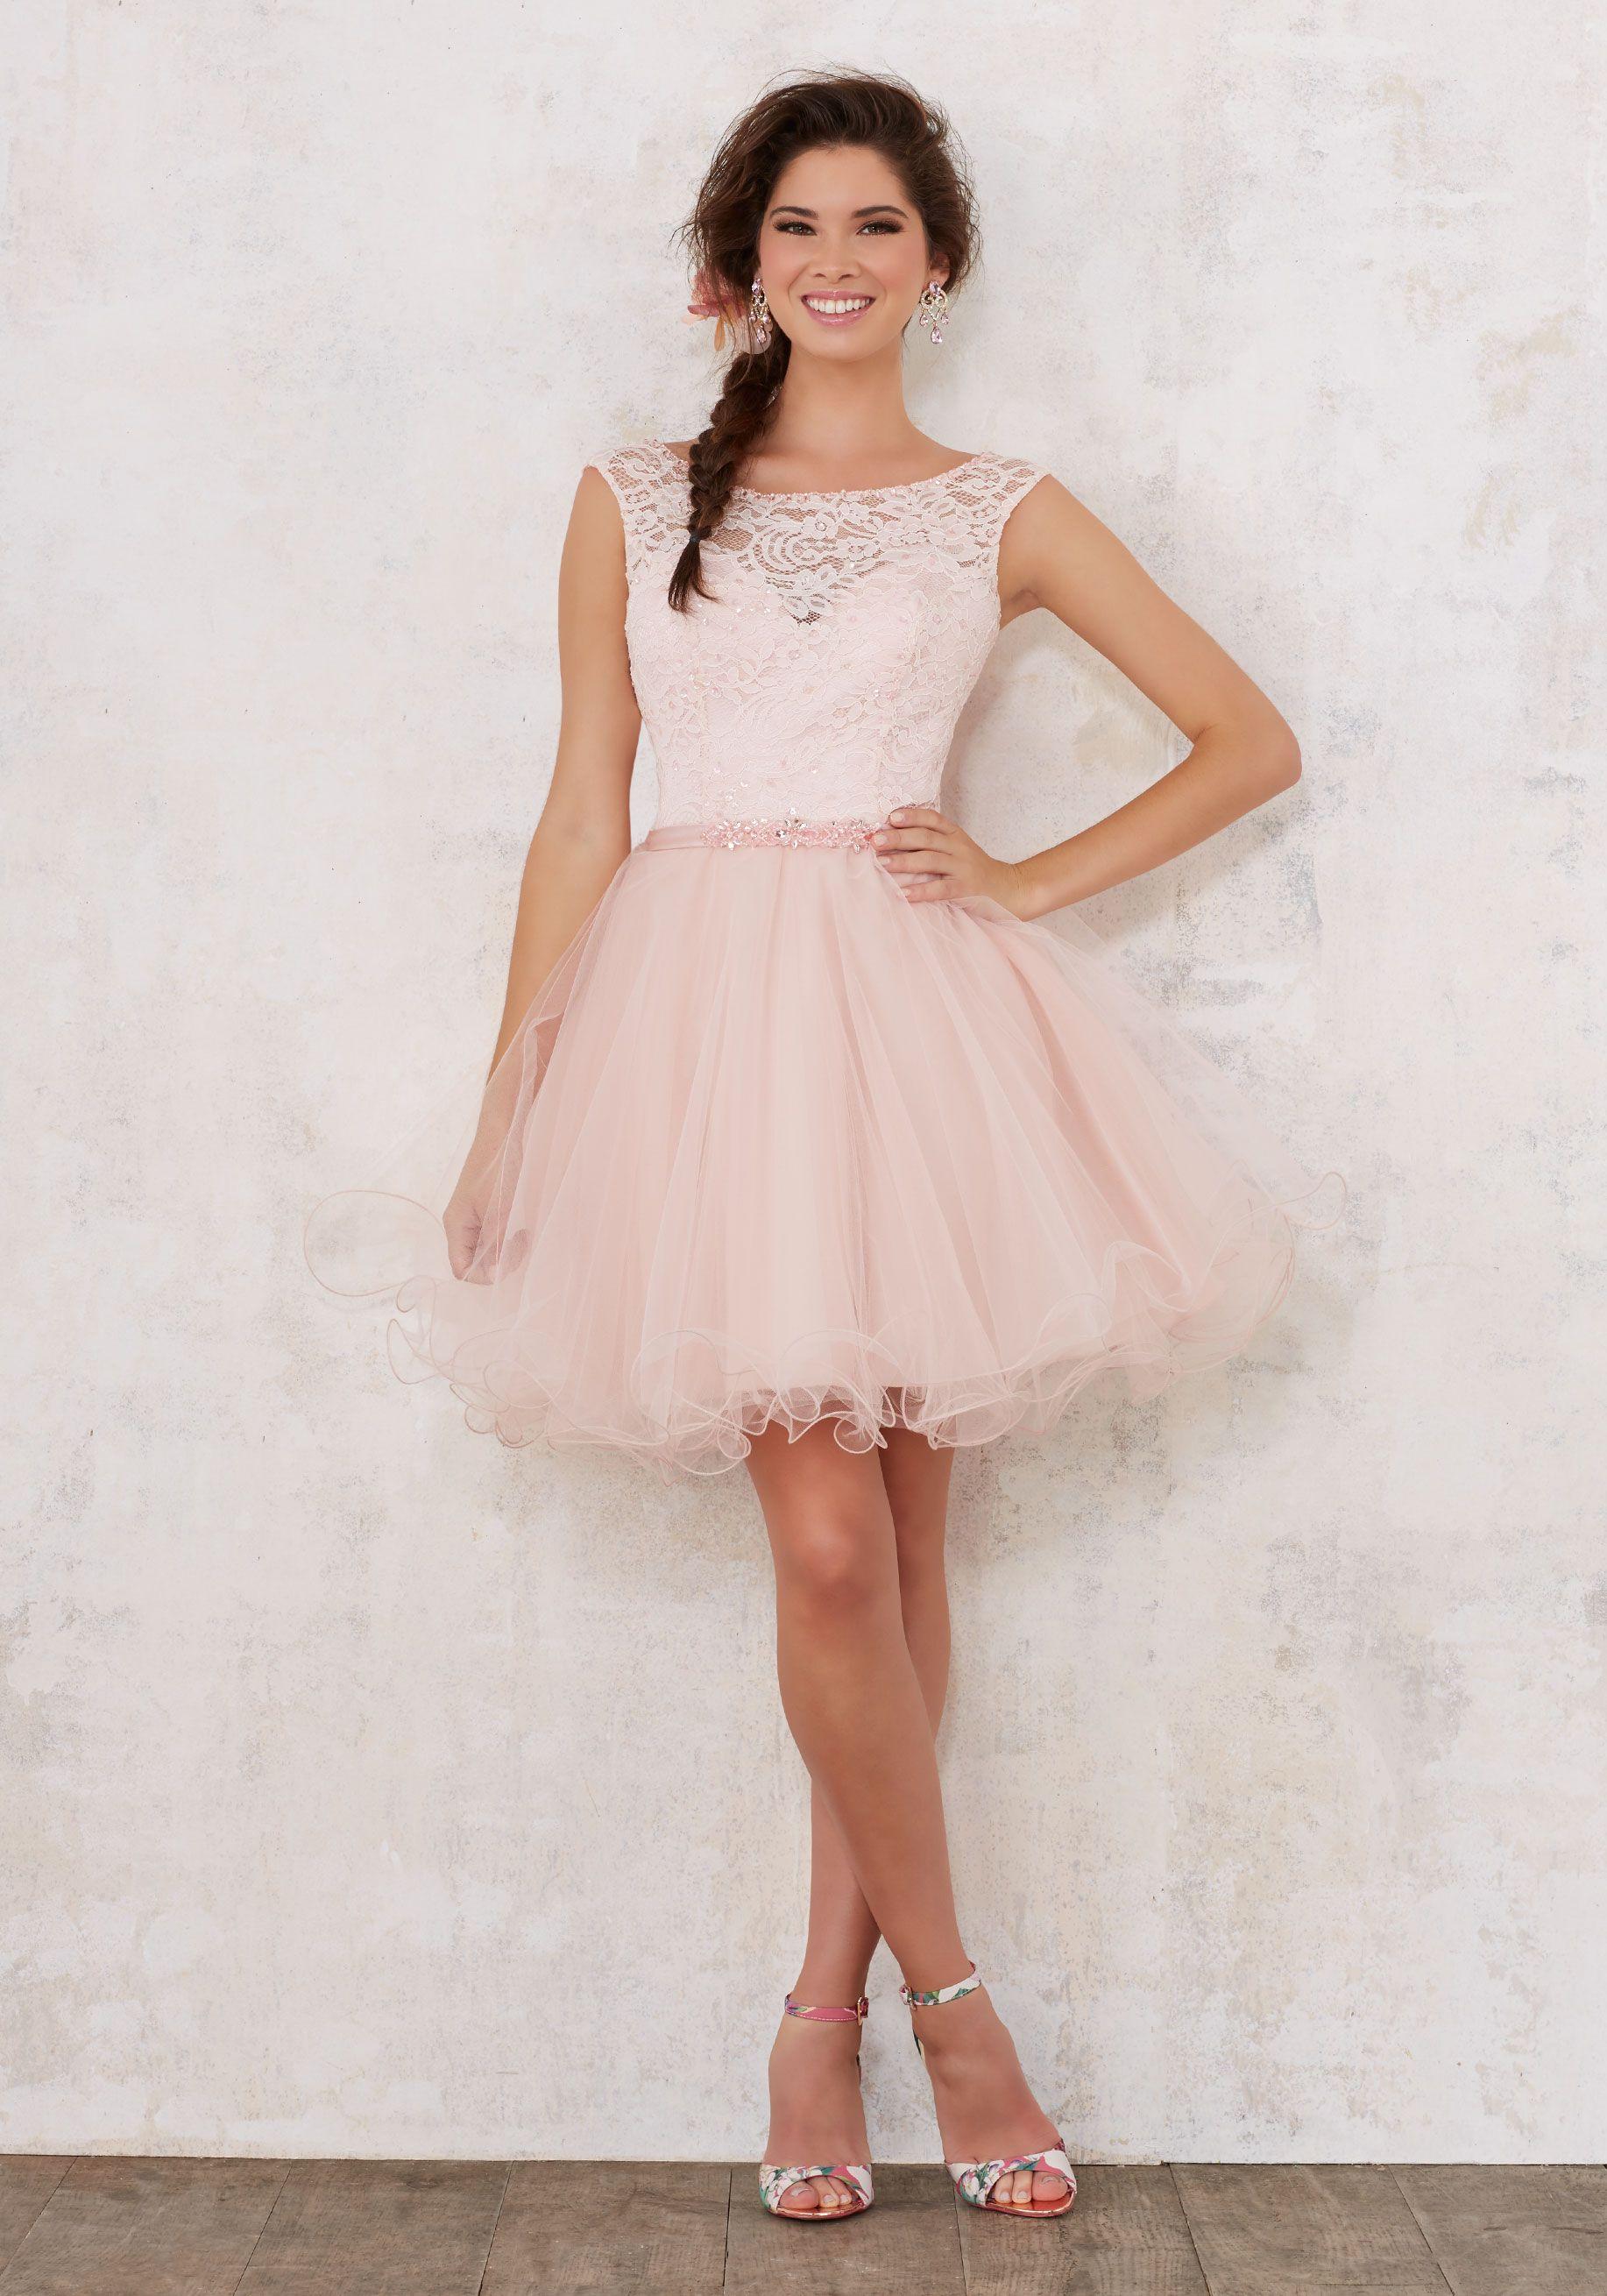 Satin Damas Dress with Beaded Waistband | Damas Style 9445 ...